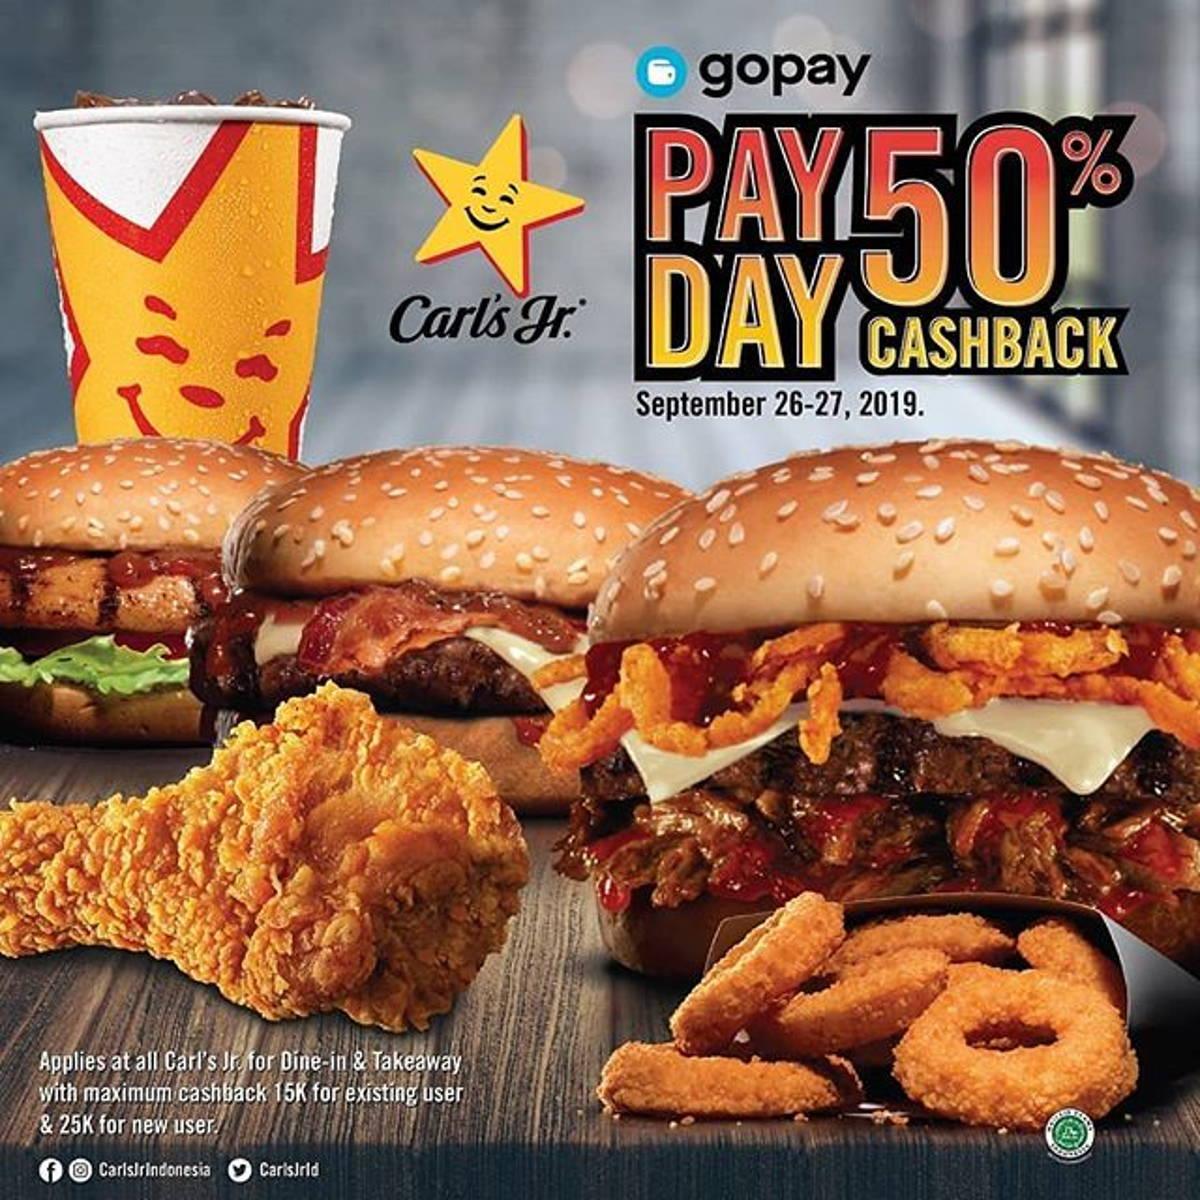 Katalog Promo: Carl's Jr.: PROMO Cashback 50% pembayaran dengan GOPAY - 1